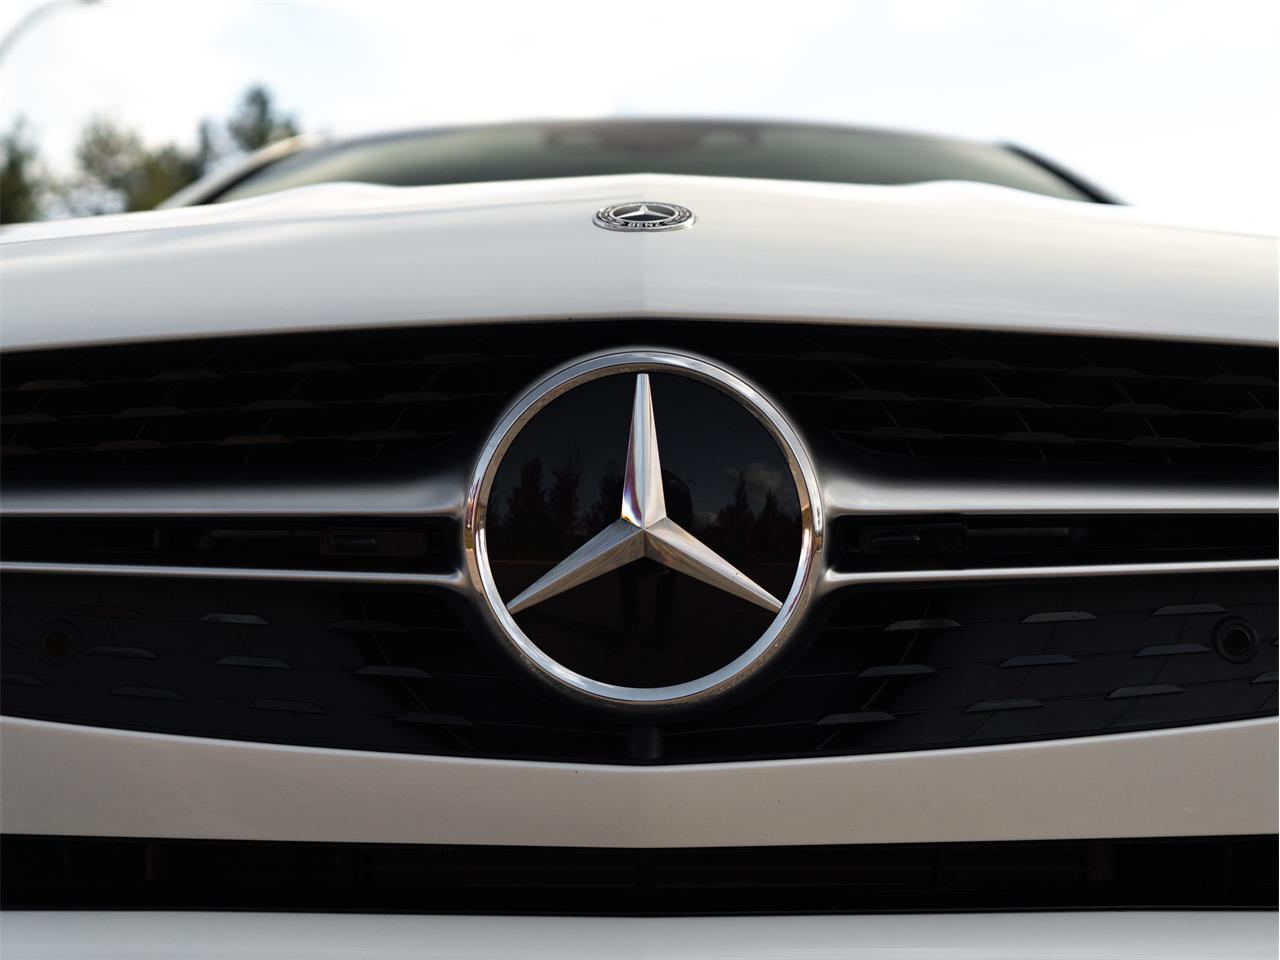 2018 Mercedes-Benz SL-Class (CC-1416316) for sale in Kelowna, British Columbia